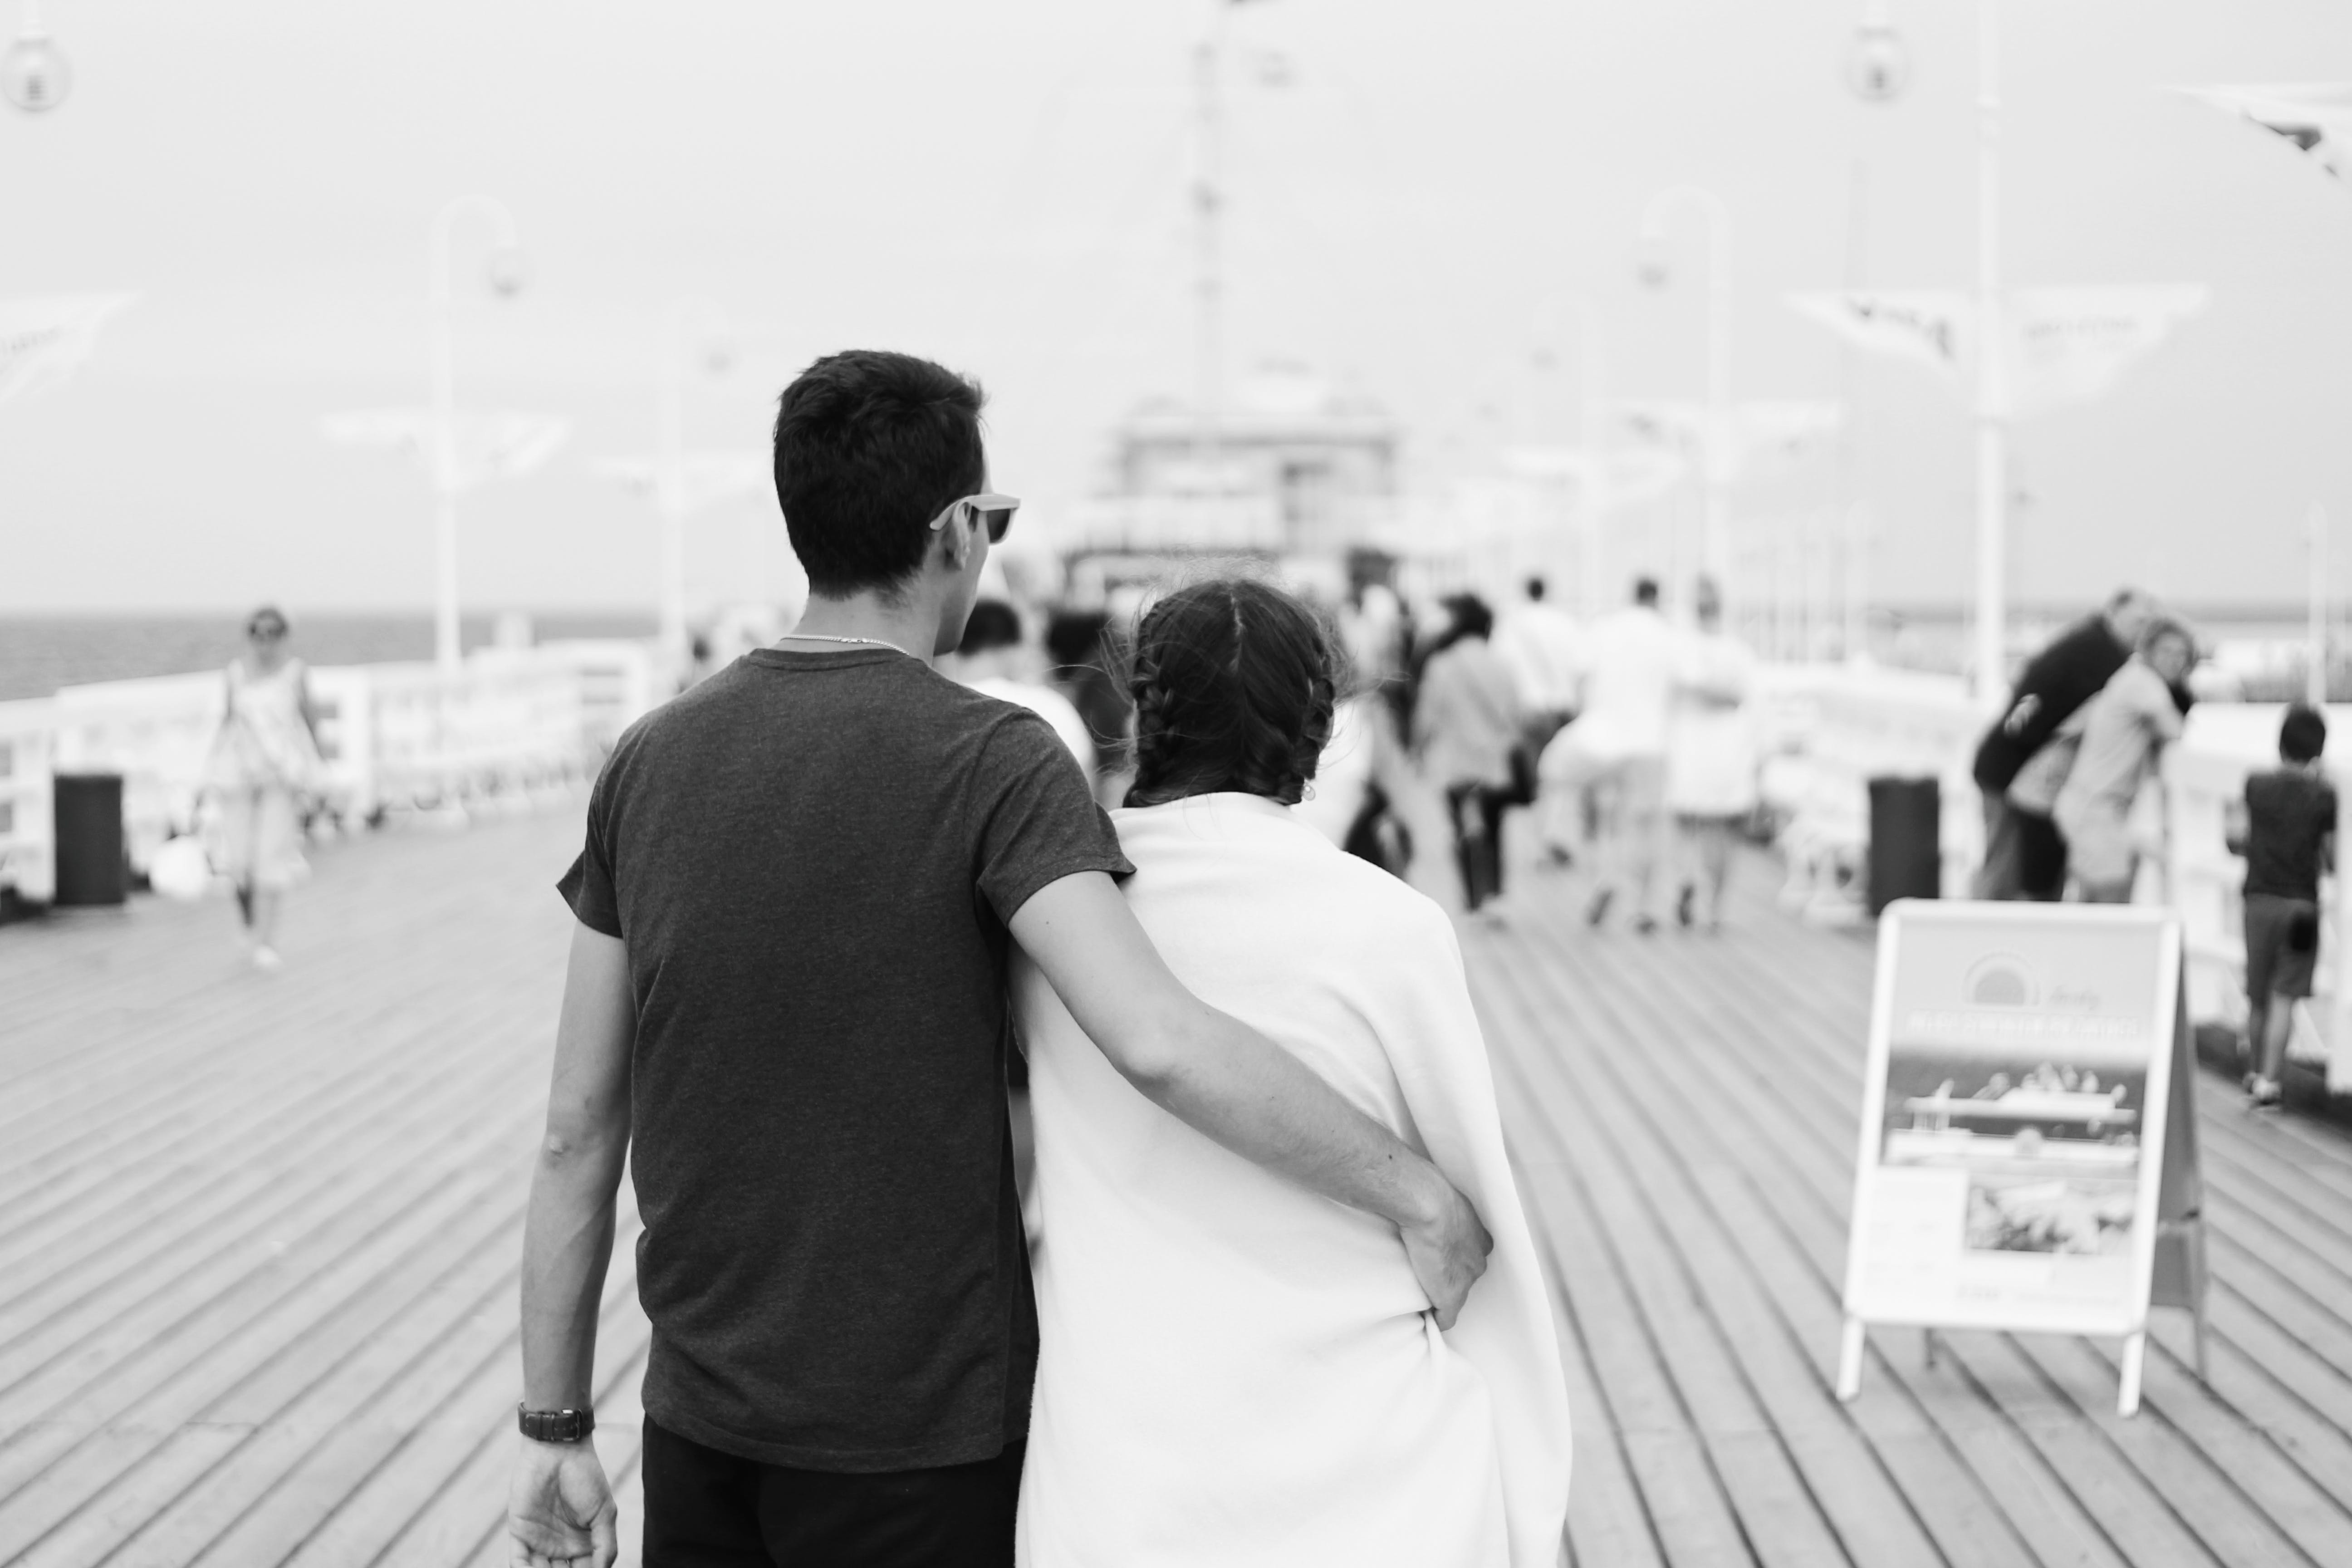 Monochrome Photography of Couple on Boardwalk